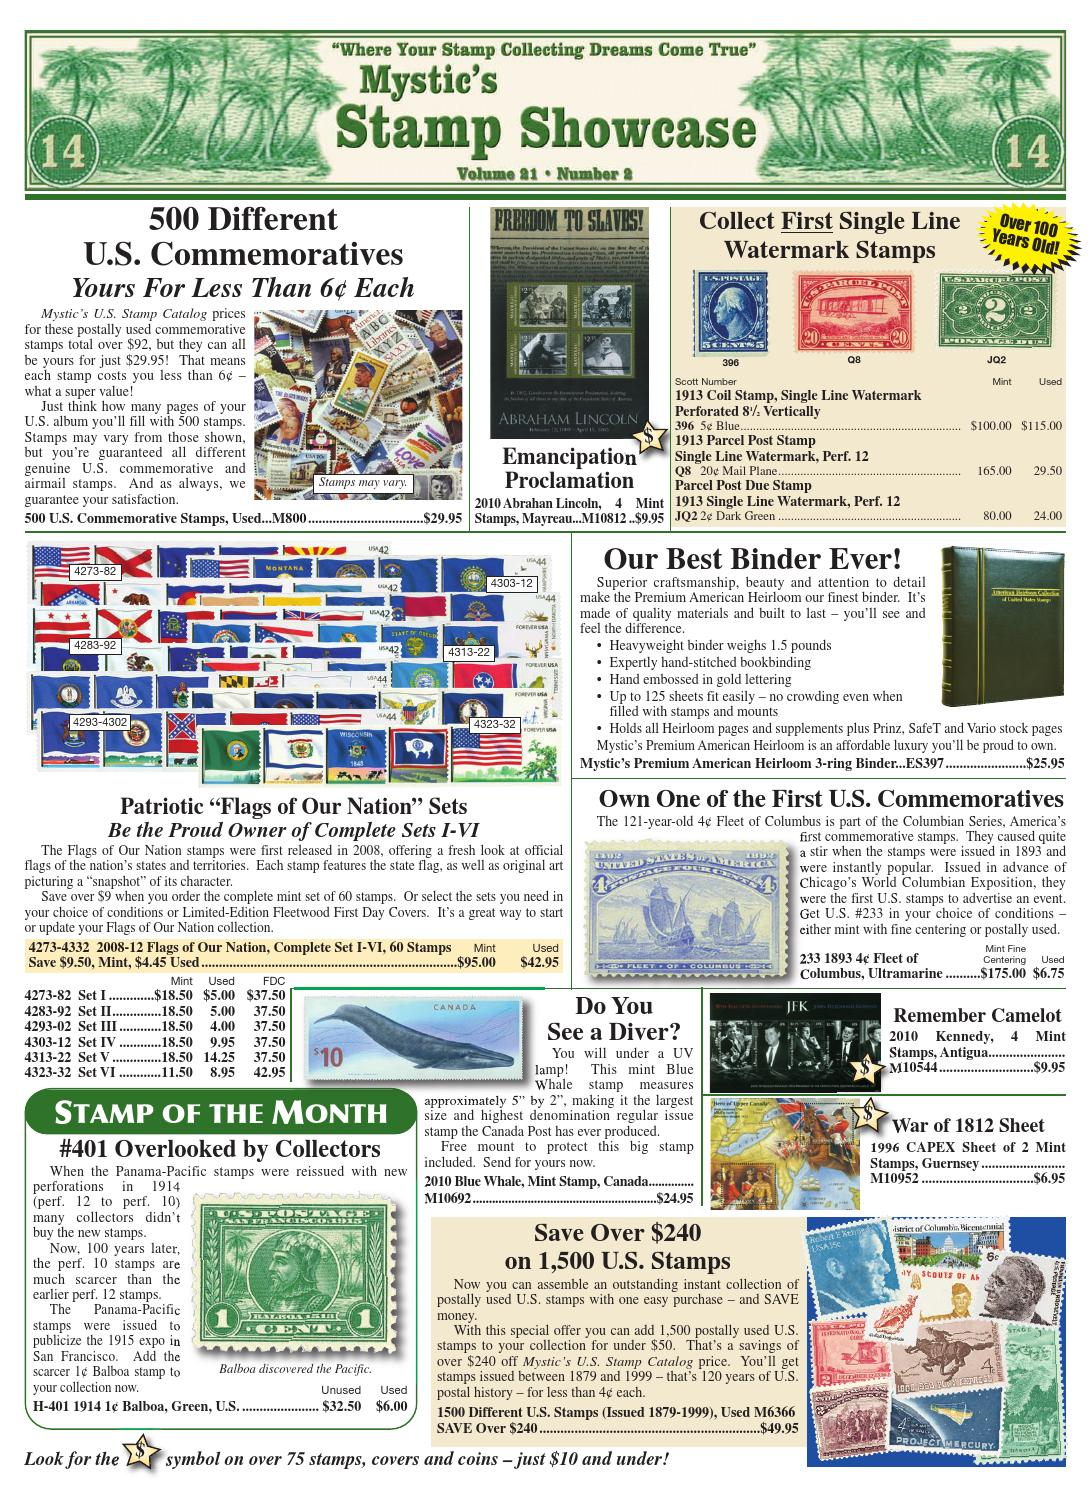 2014 March Showcasemystic Stamp Company - Issuu in North Penn School District Calendar 2021-20